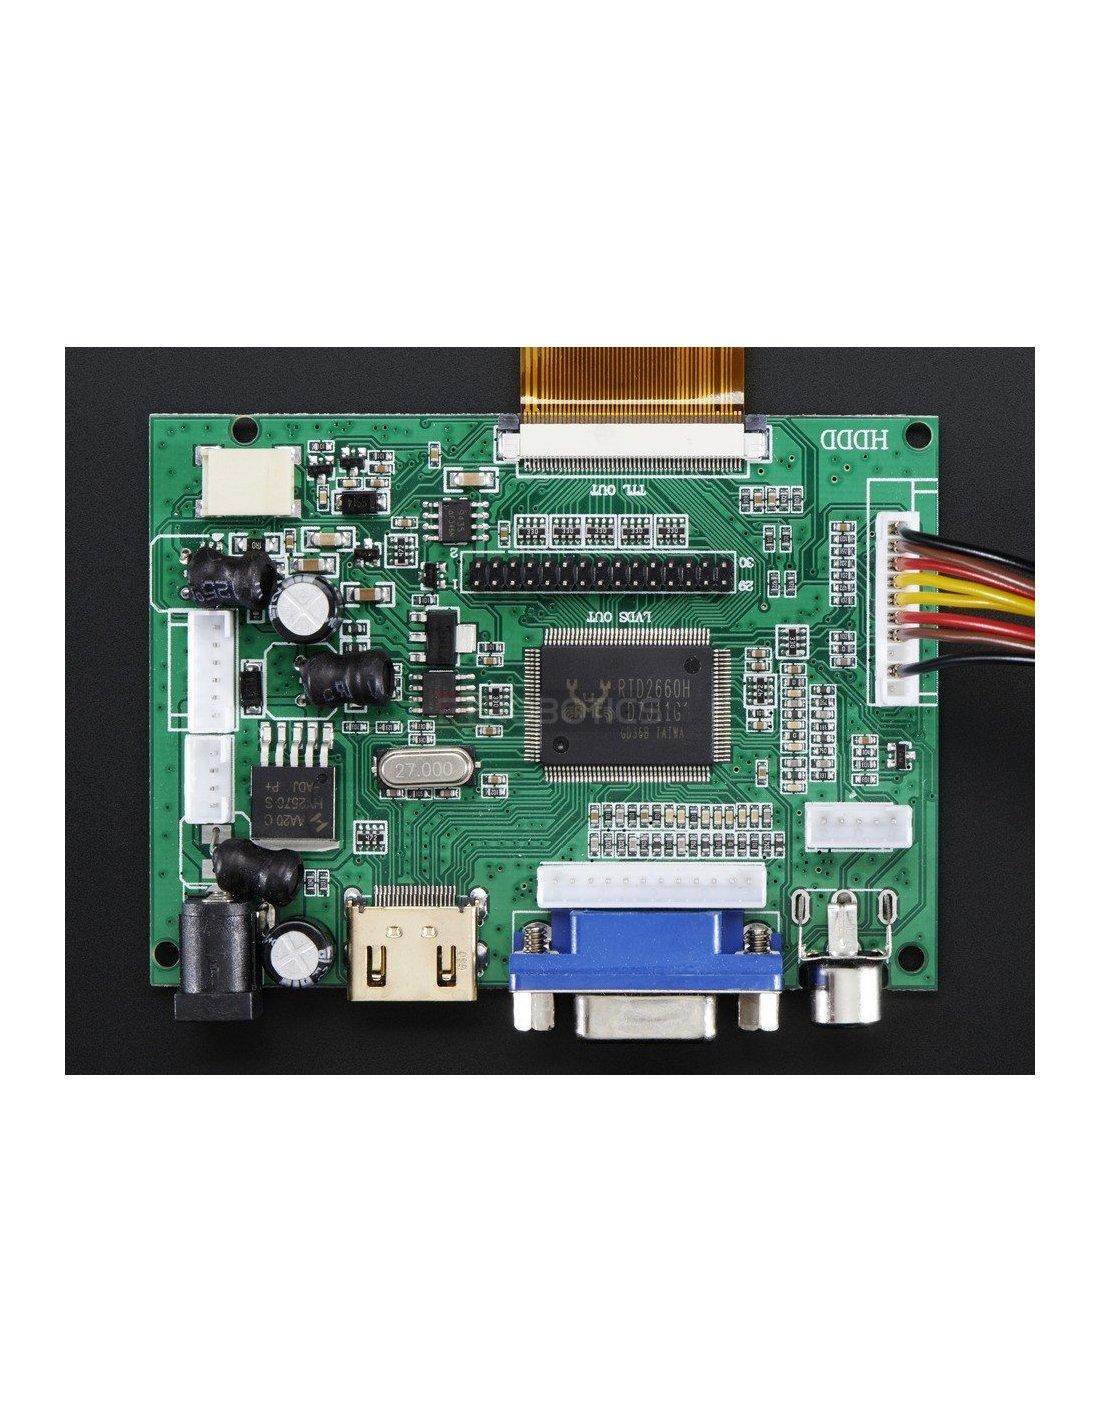 HDMI 4 Pi: 7